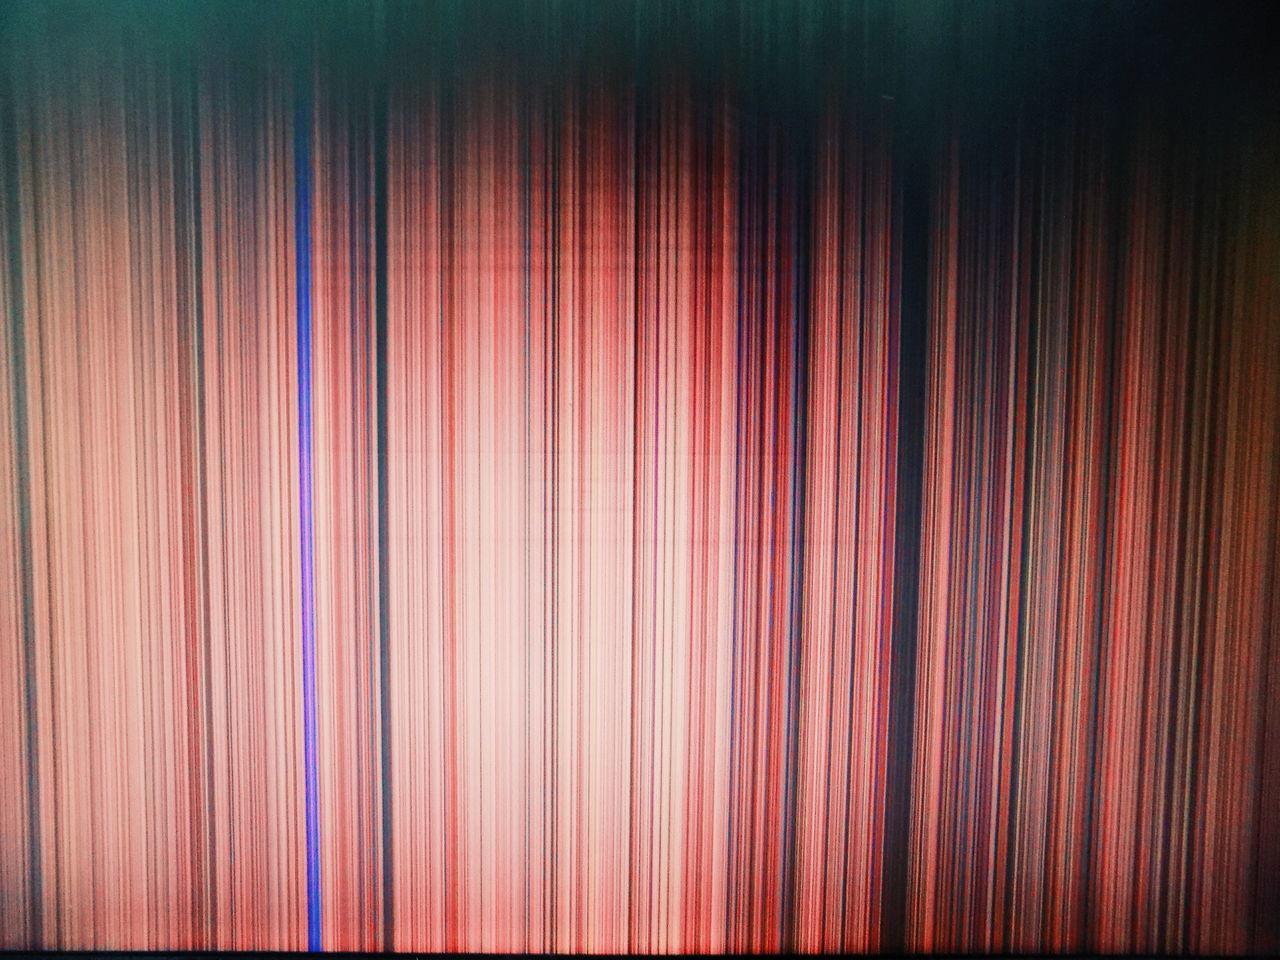 VIEW OF ILLUMINATED LIGHTING EQUIPMENT IN ROOM